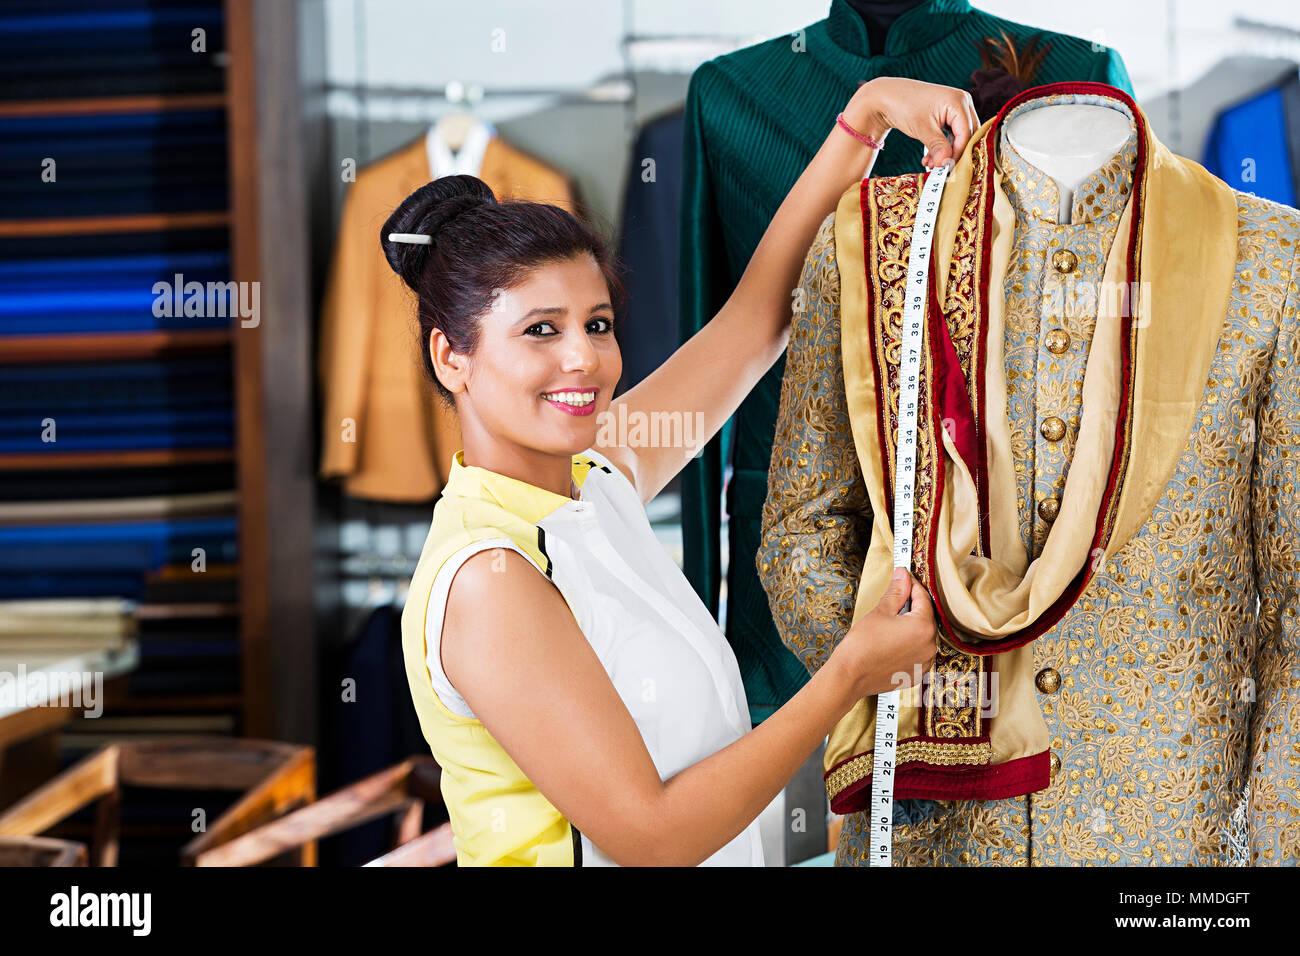 One Boutique Female Tailor Dress Designer Tape Measuring Sherwani Clothe Shop